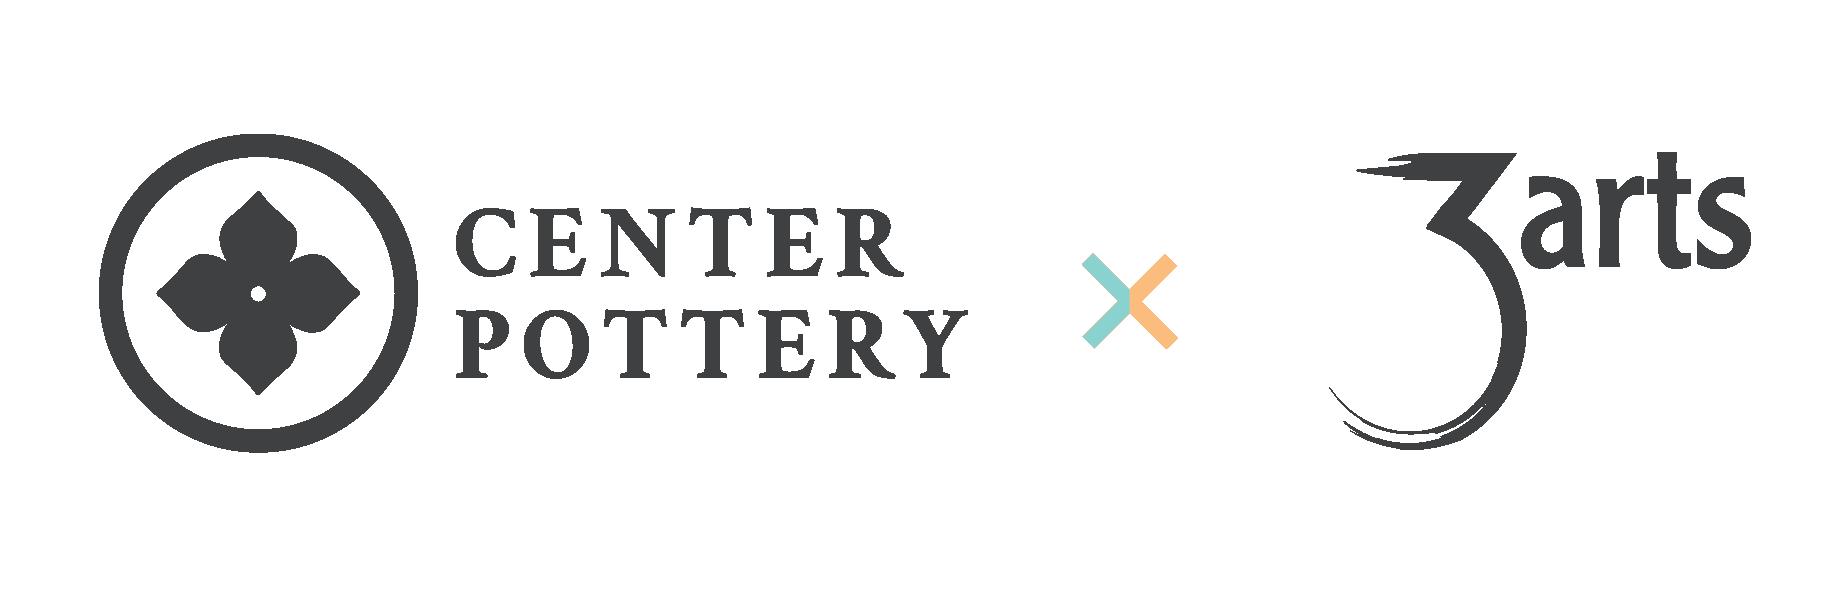 3 arts / Center Pottery -